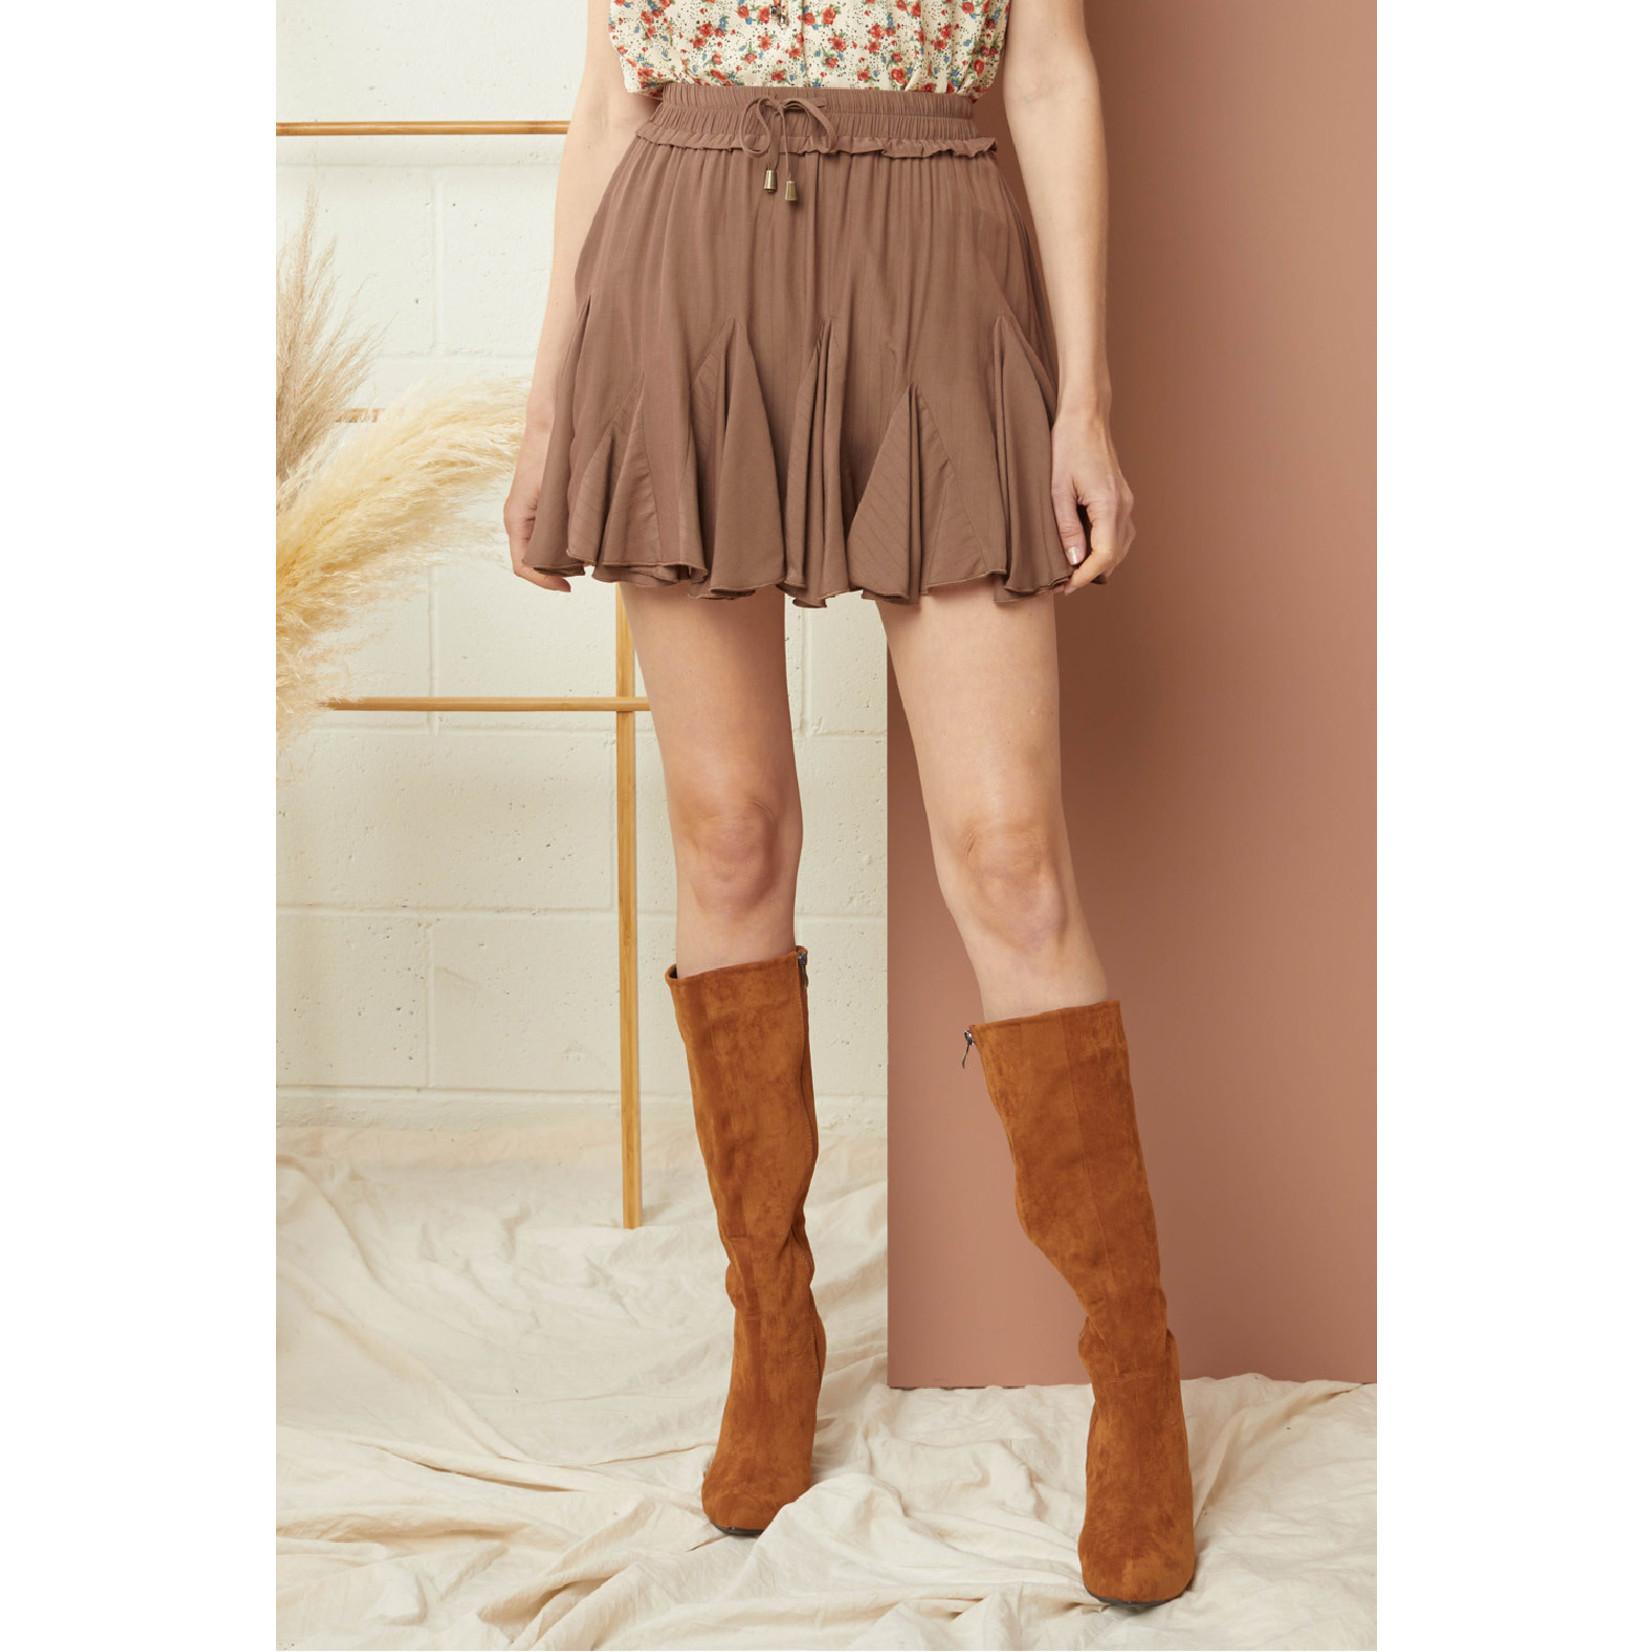 Entro Drawstring Waist Skirt with Shorts